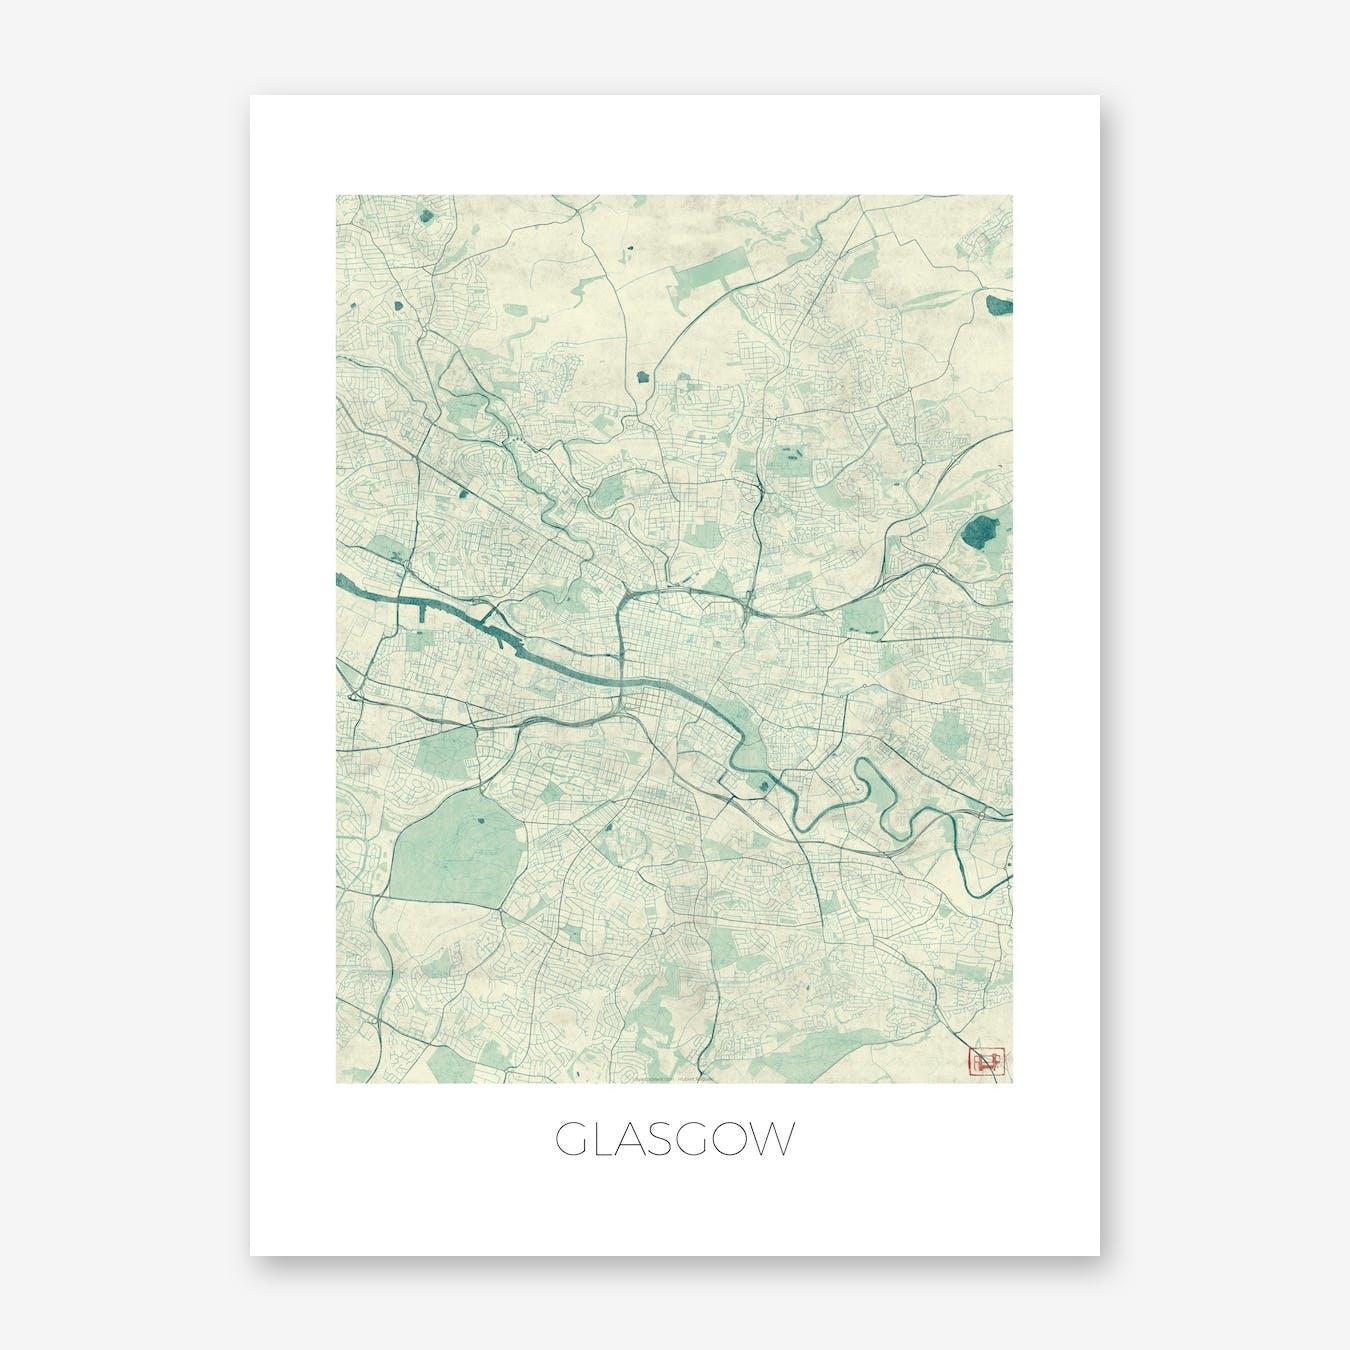 Glasgow Map Vintage in Blue